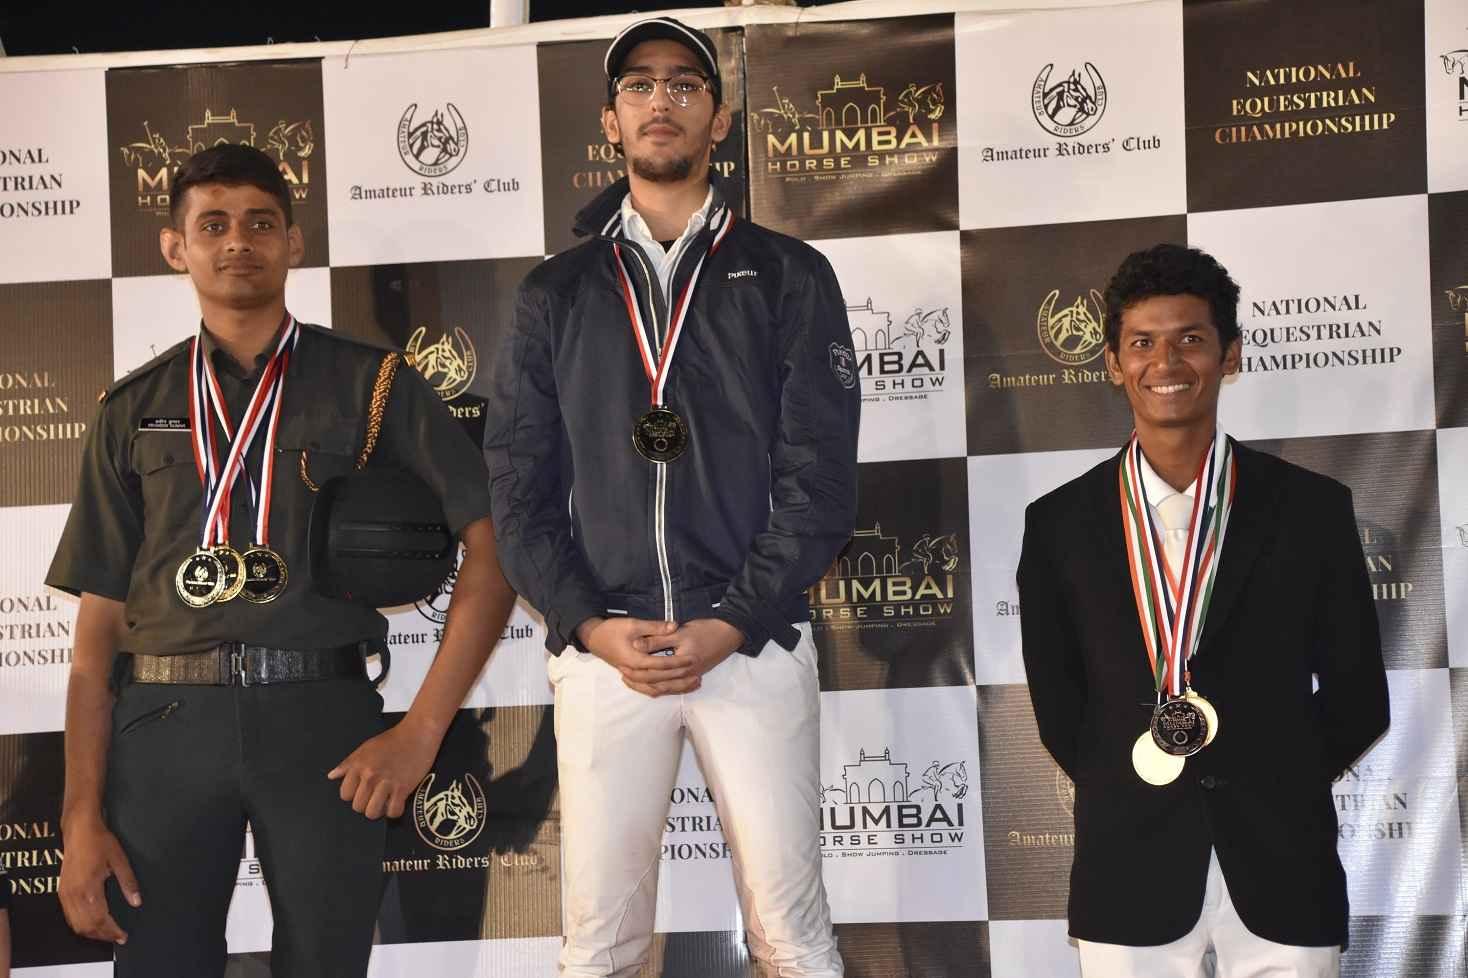 National Equestrian Championship winners